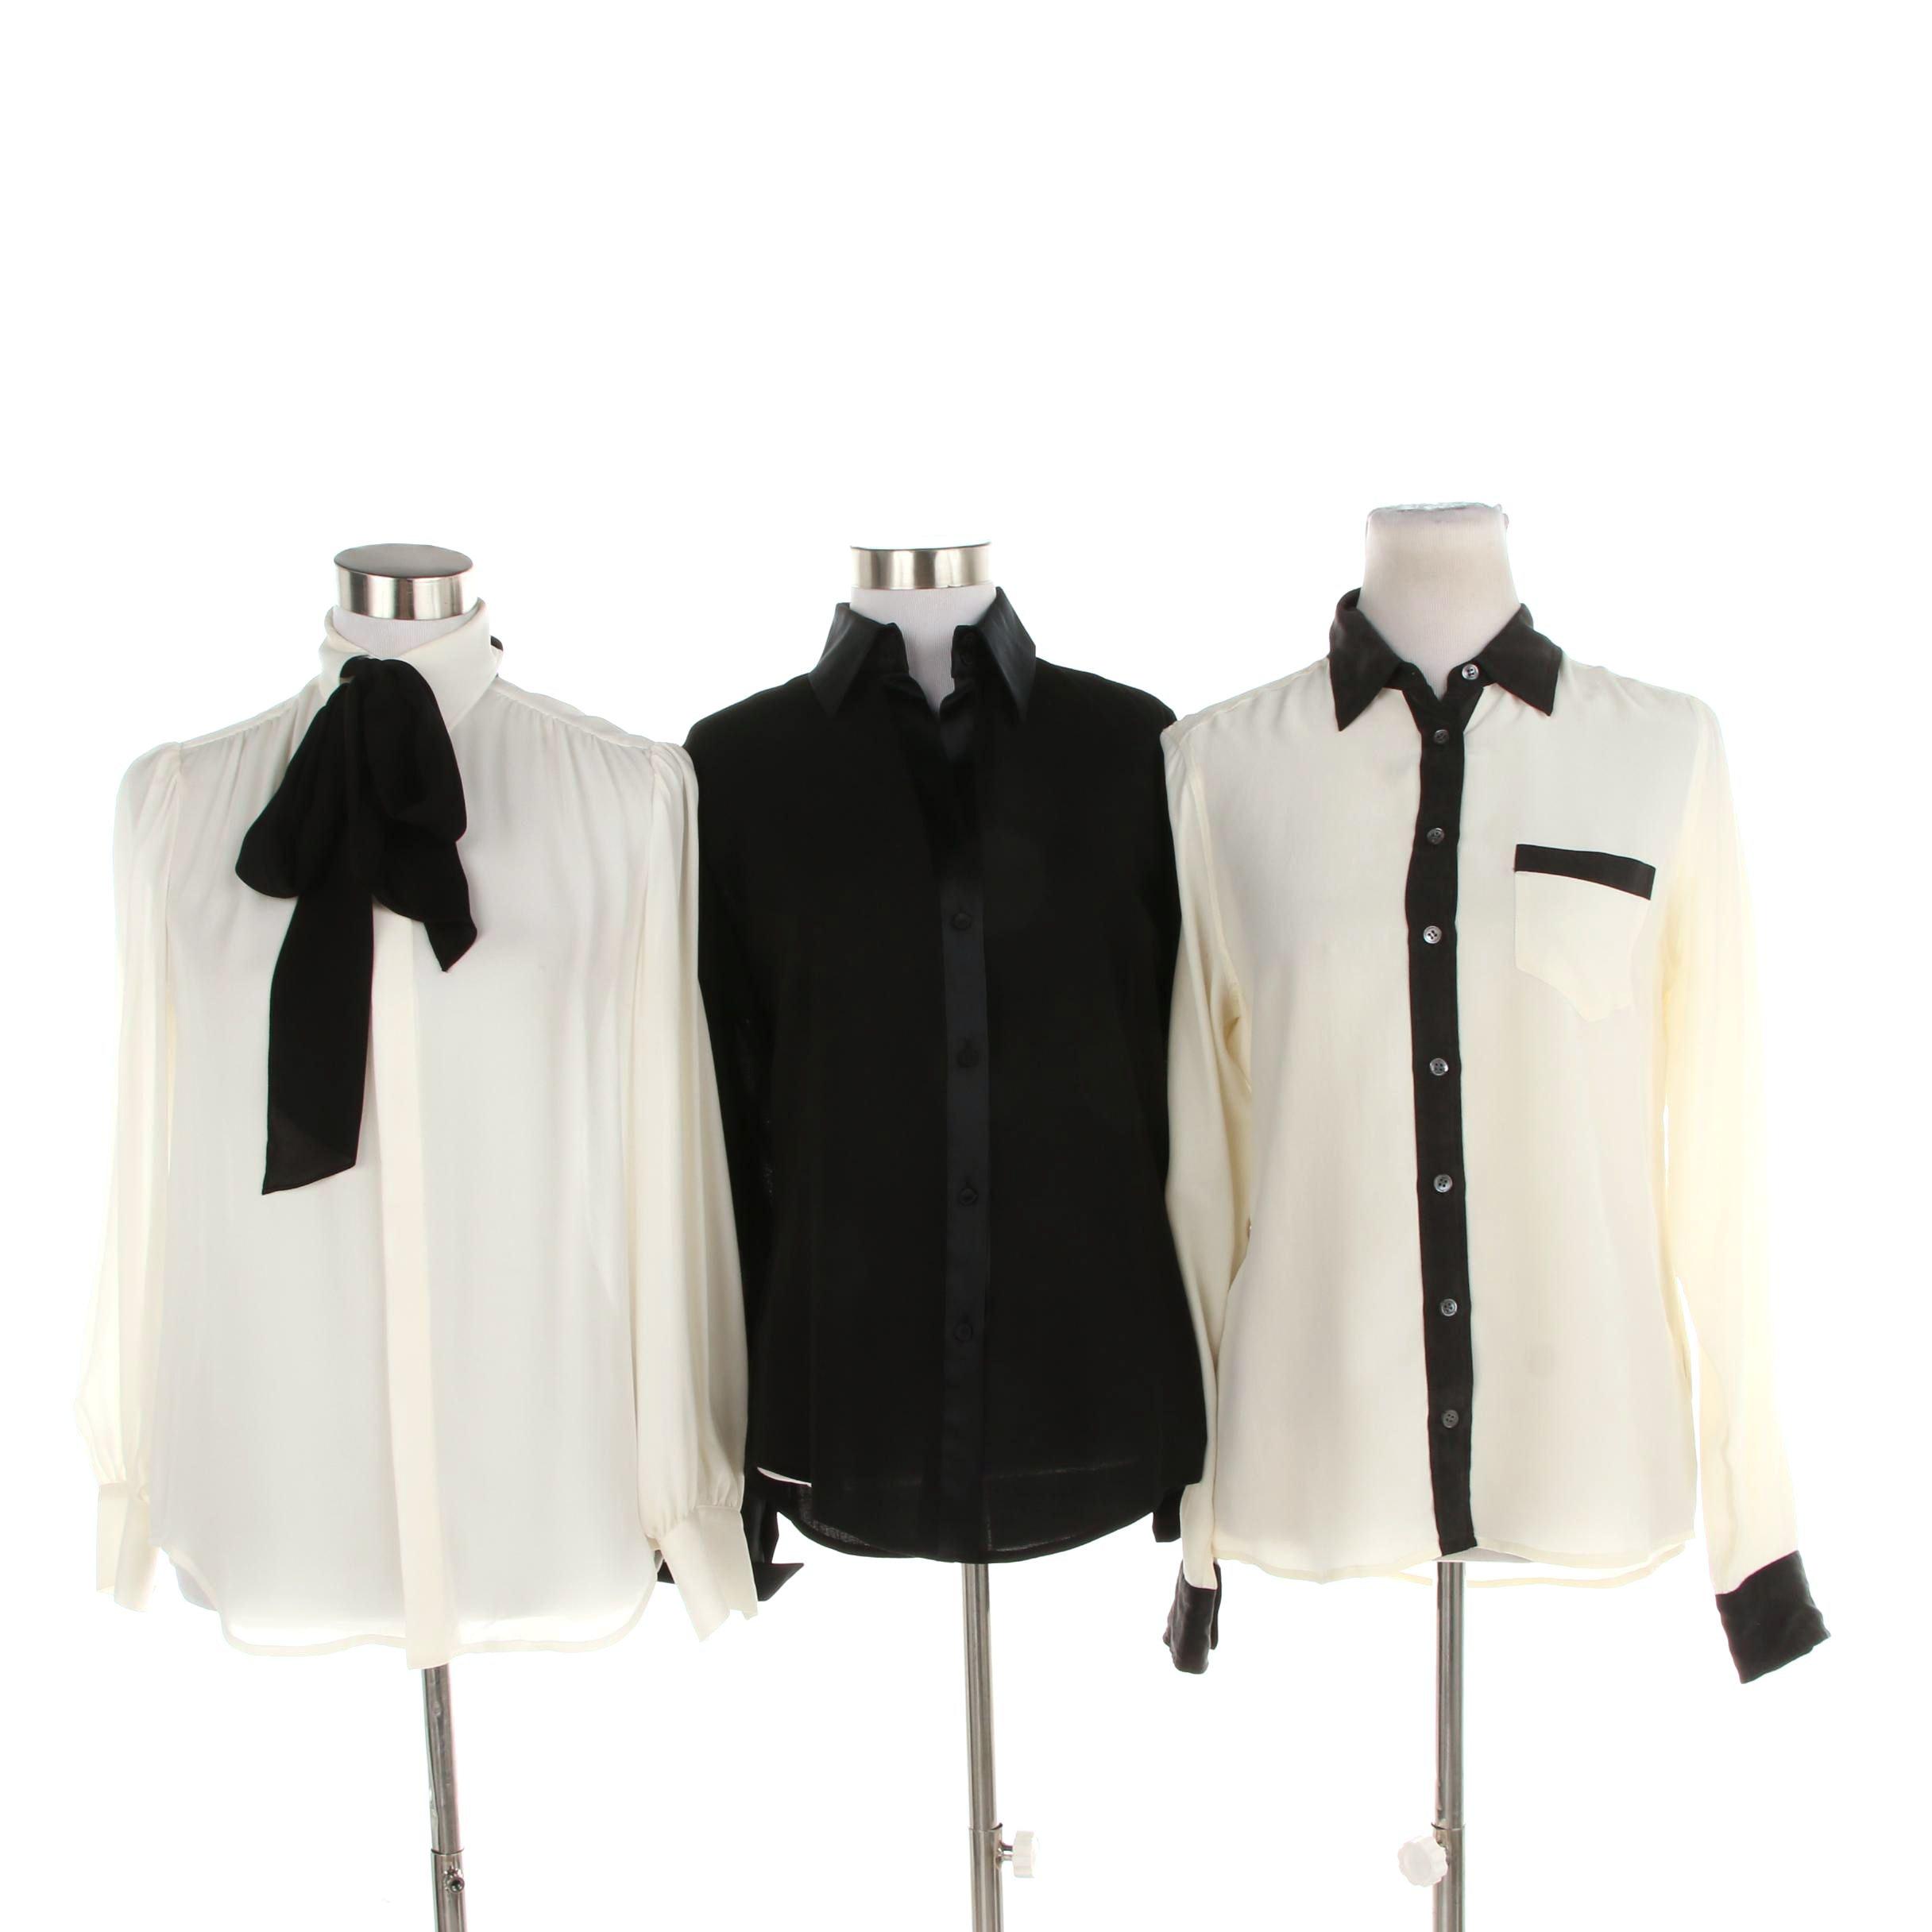 Women's Button-Front Blouses including Dana Buchman and Polo Ralph Lauren